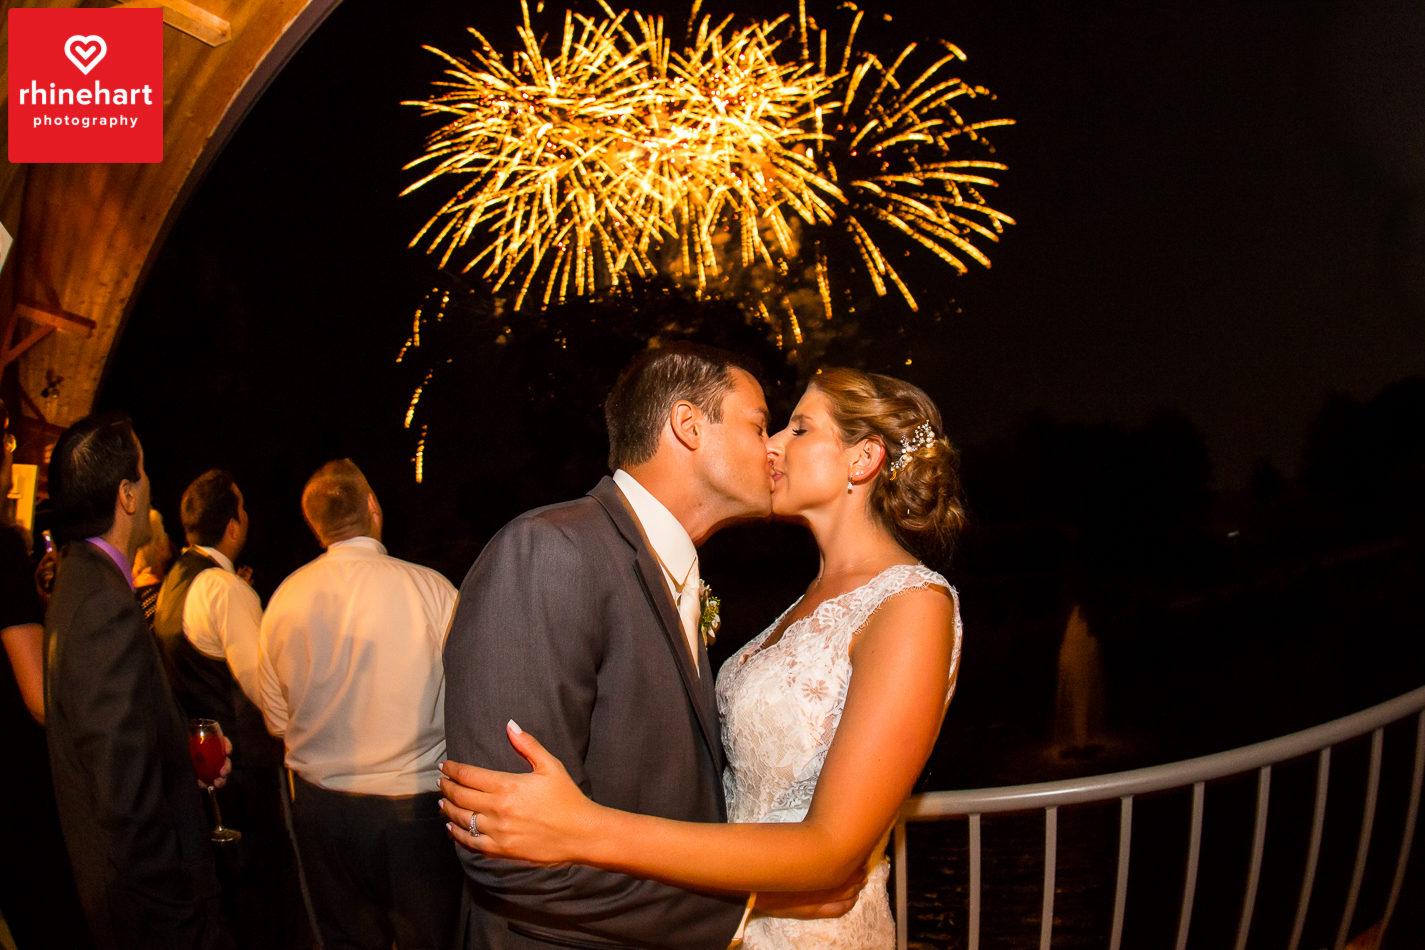 glasbern-inn-wedding-photographer-239